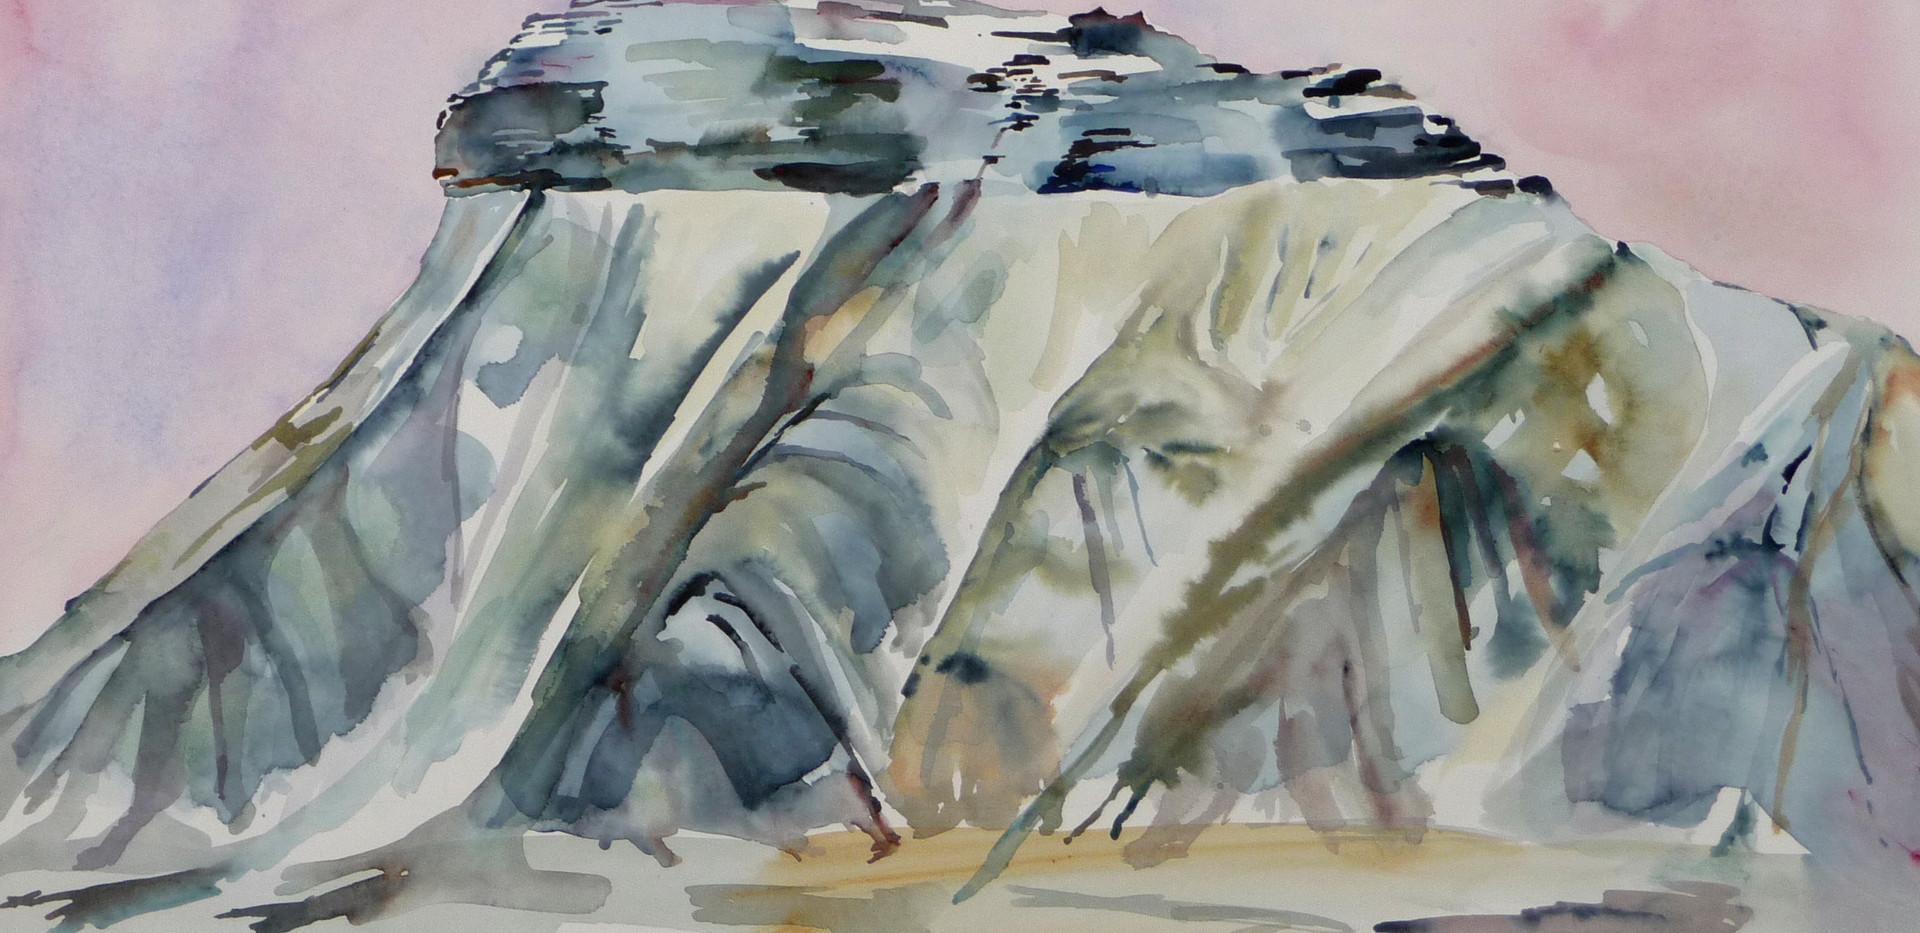 Pyramiden mountain - Large